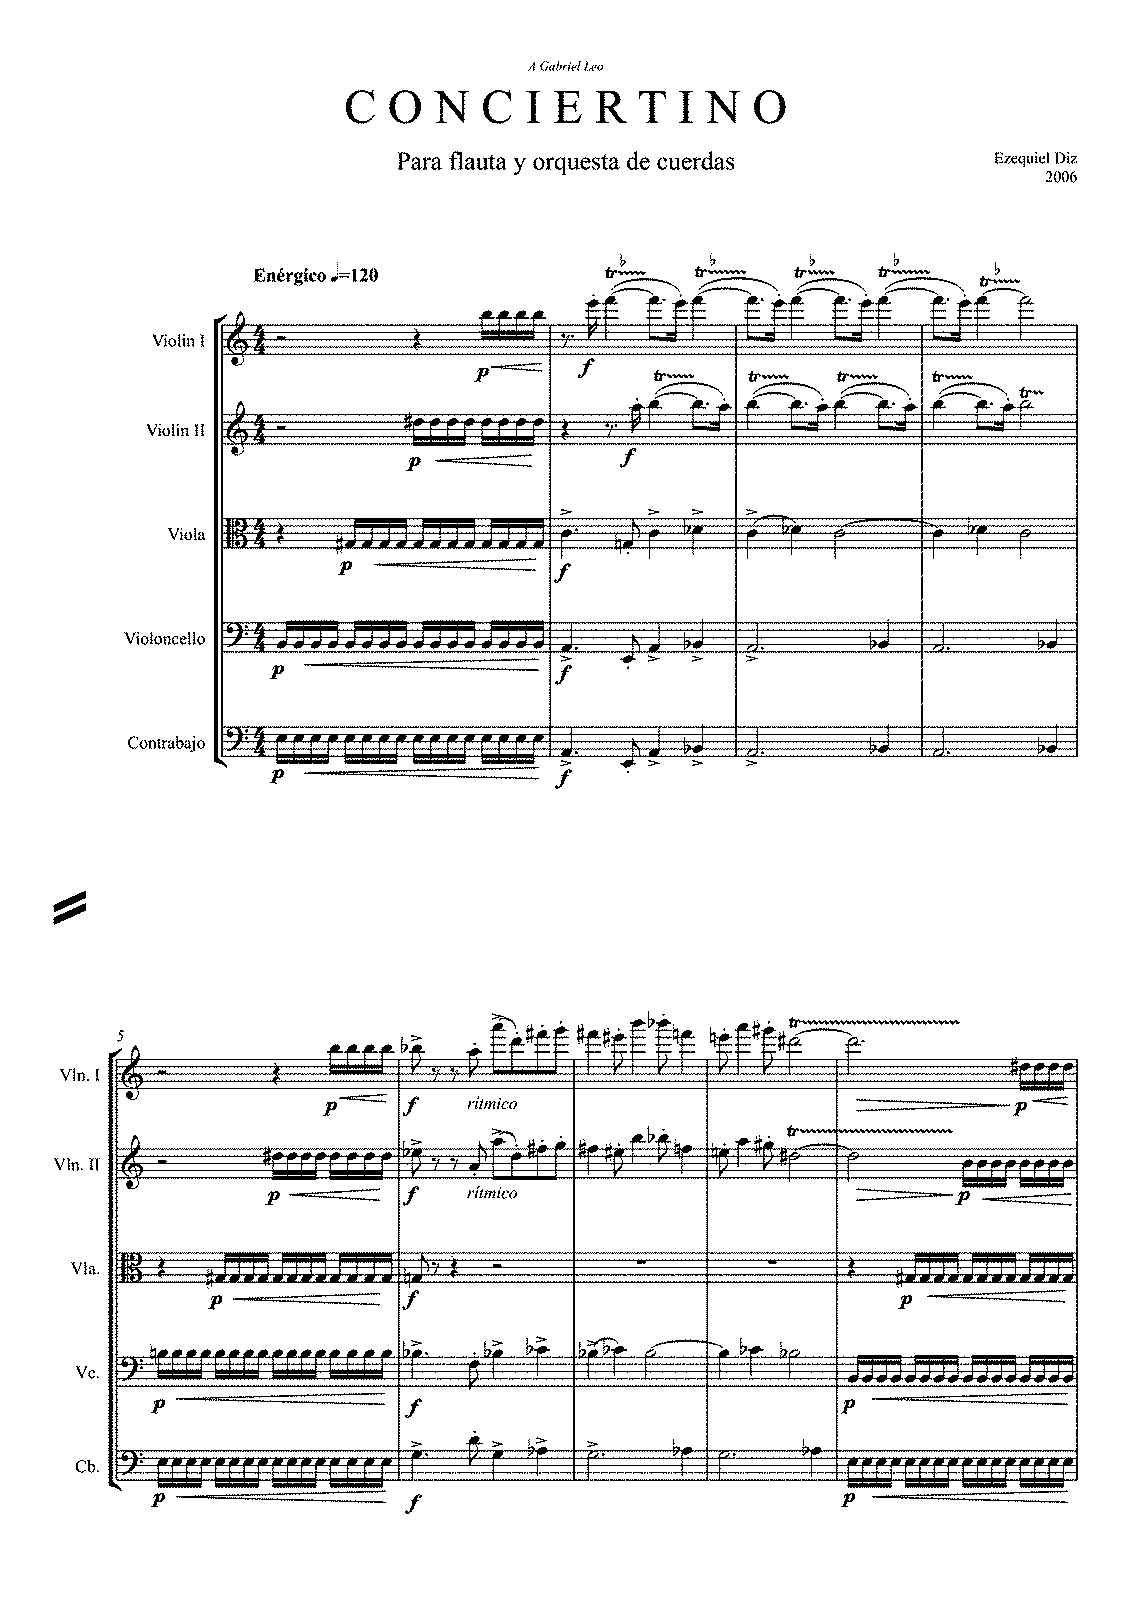 Flute Concertino (Diz, Ezequiel) - IMSLP/Petrucci Music Library